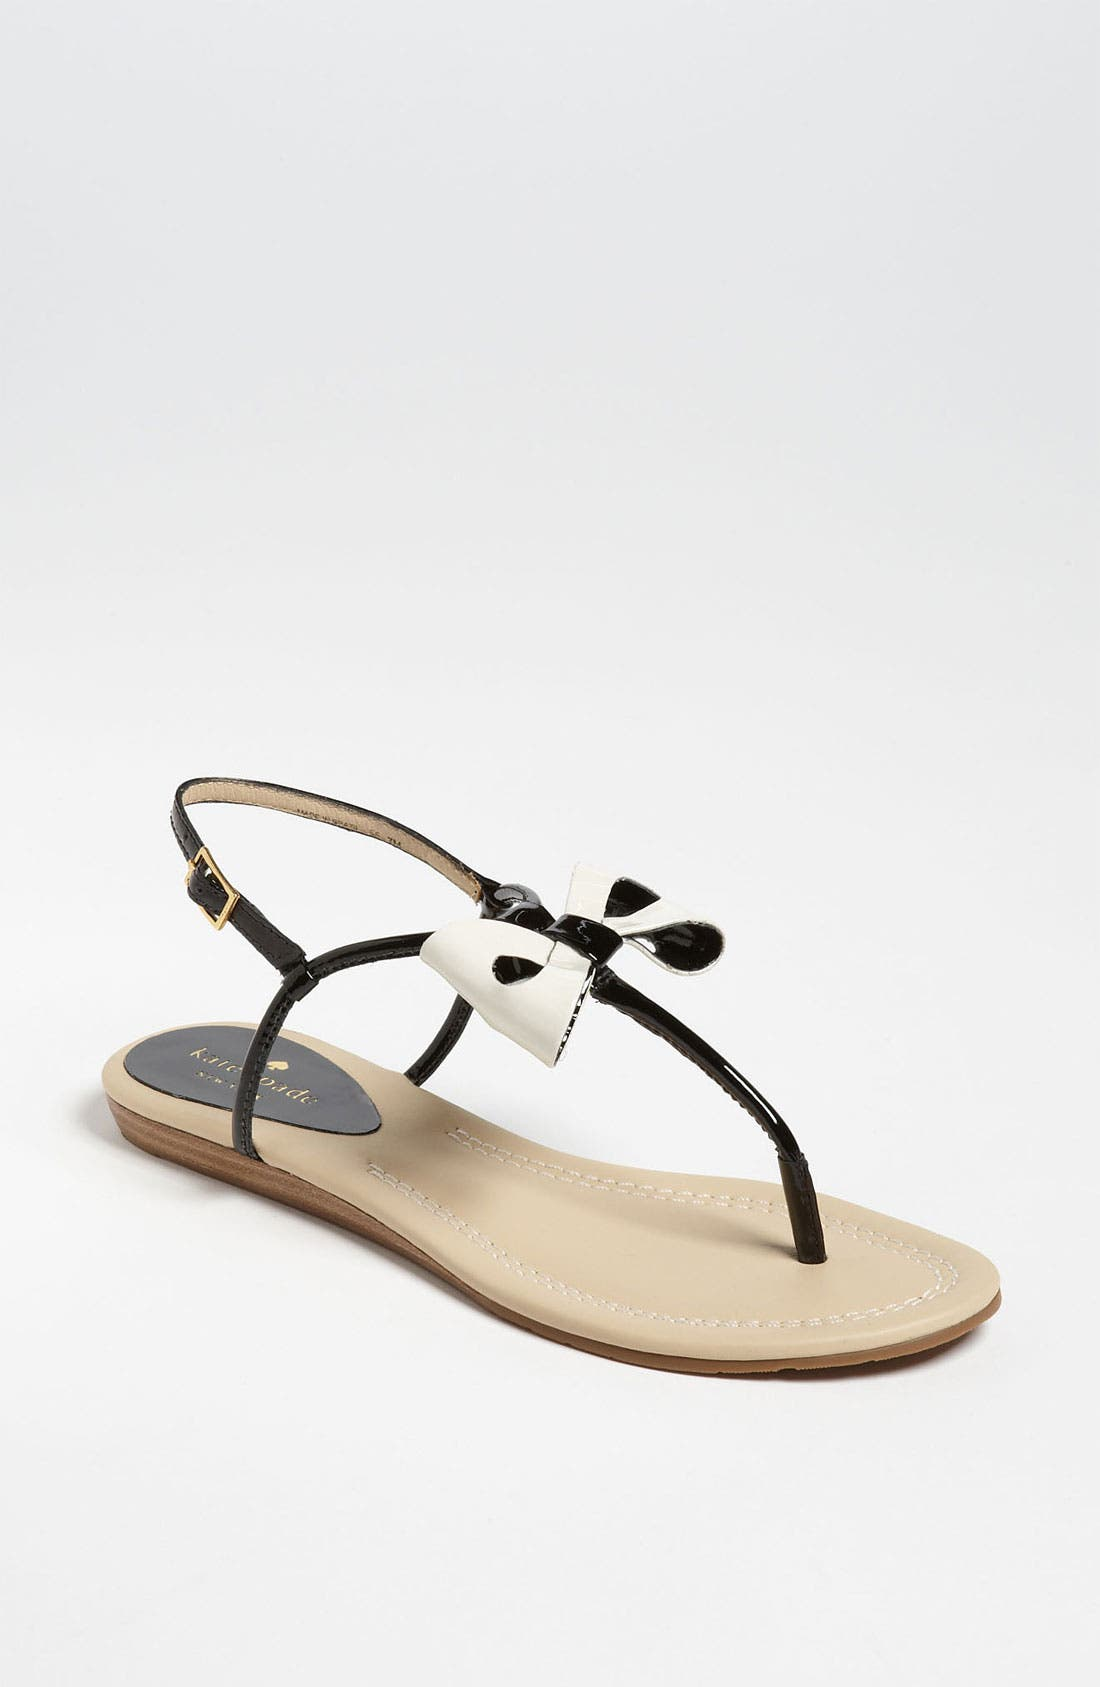 Alternate Image 1 Selected - kate spade new york 'trendy' sandal